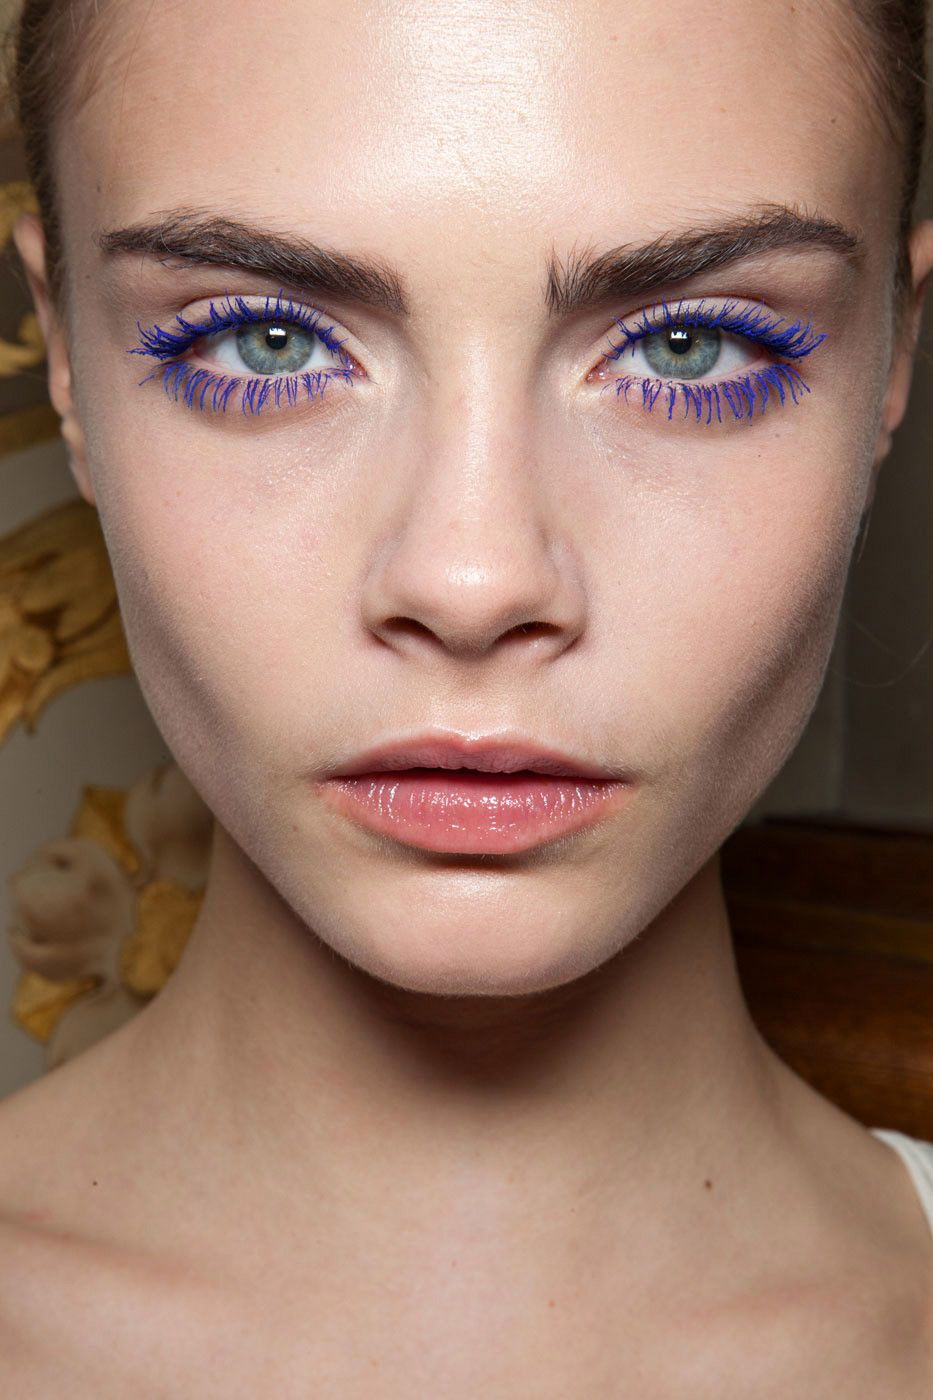 161a987130e blue mascara. done right | MakeUp in 2019 | Colored mascara, Blue ...